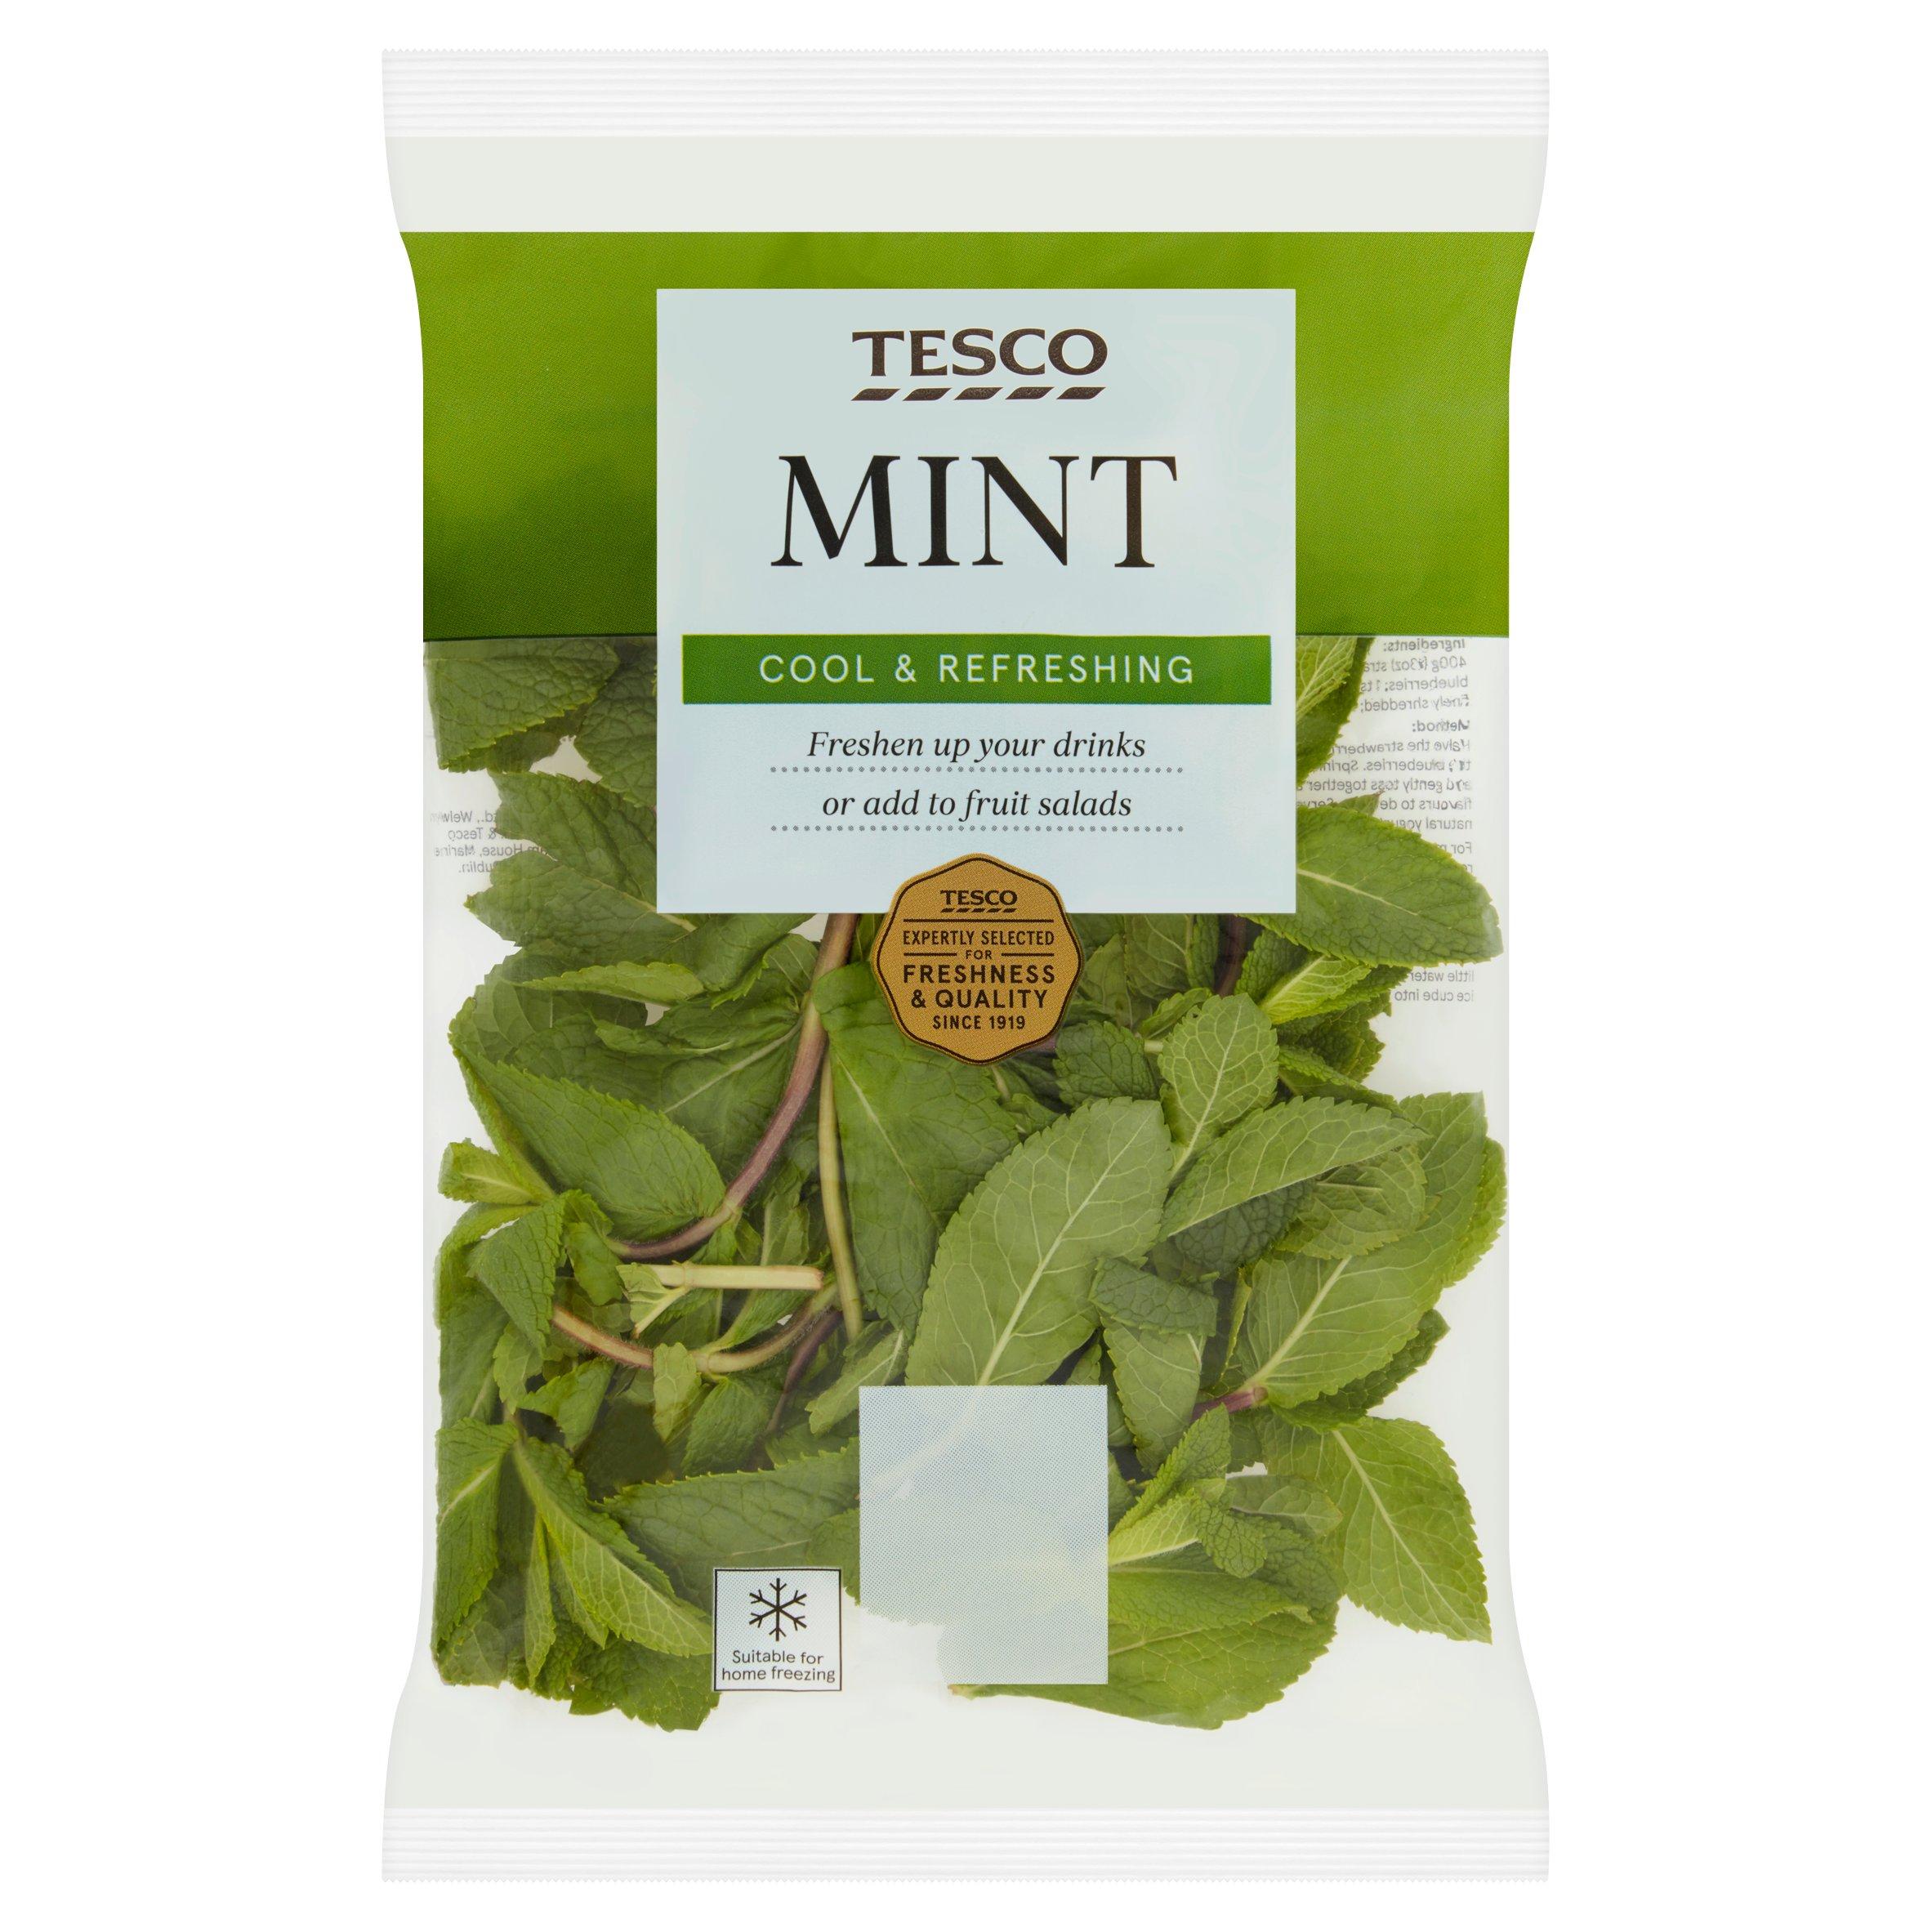 TESCO > Fresh Food > Tesco Mint 30G